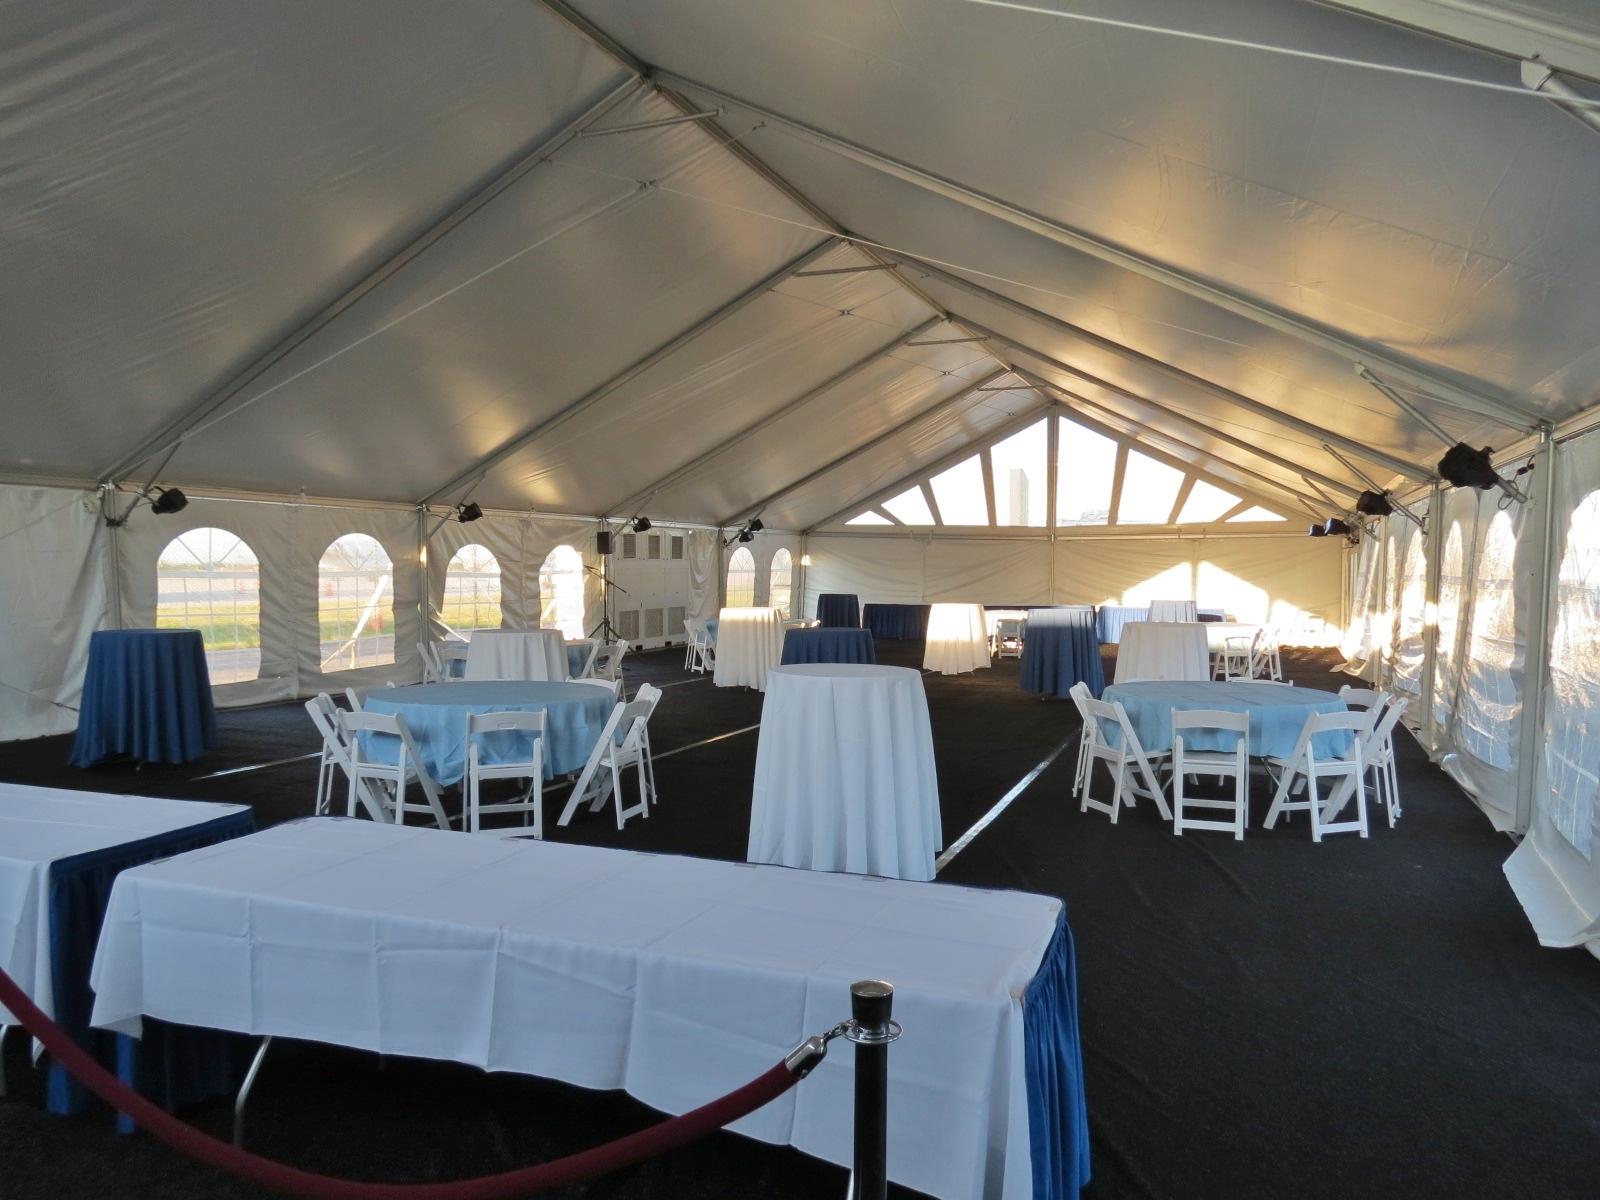 Rent Tent Carpeting in PA